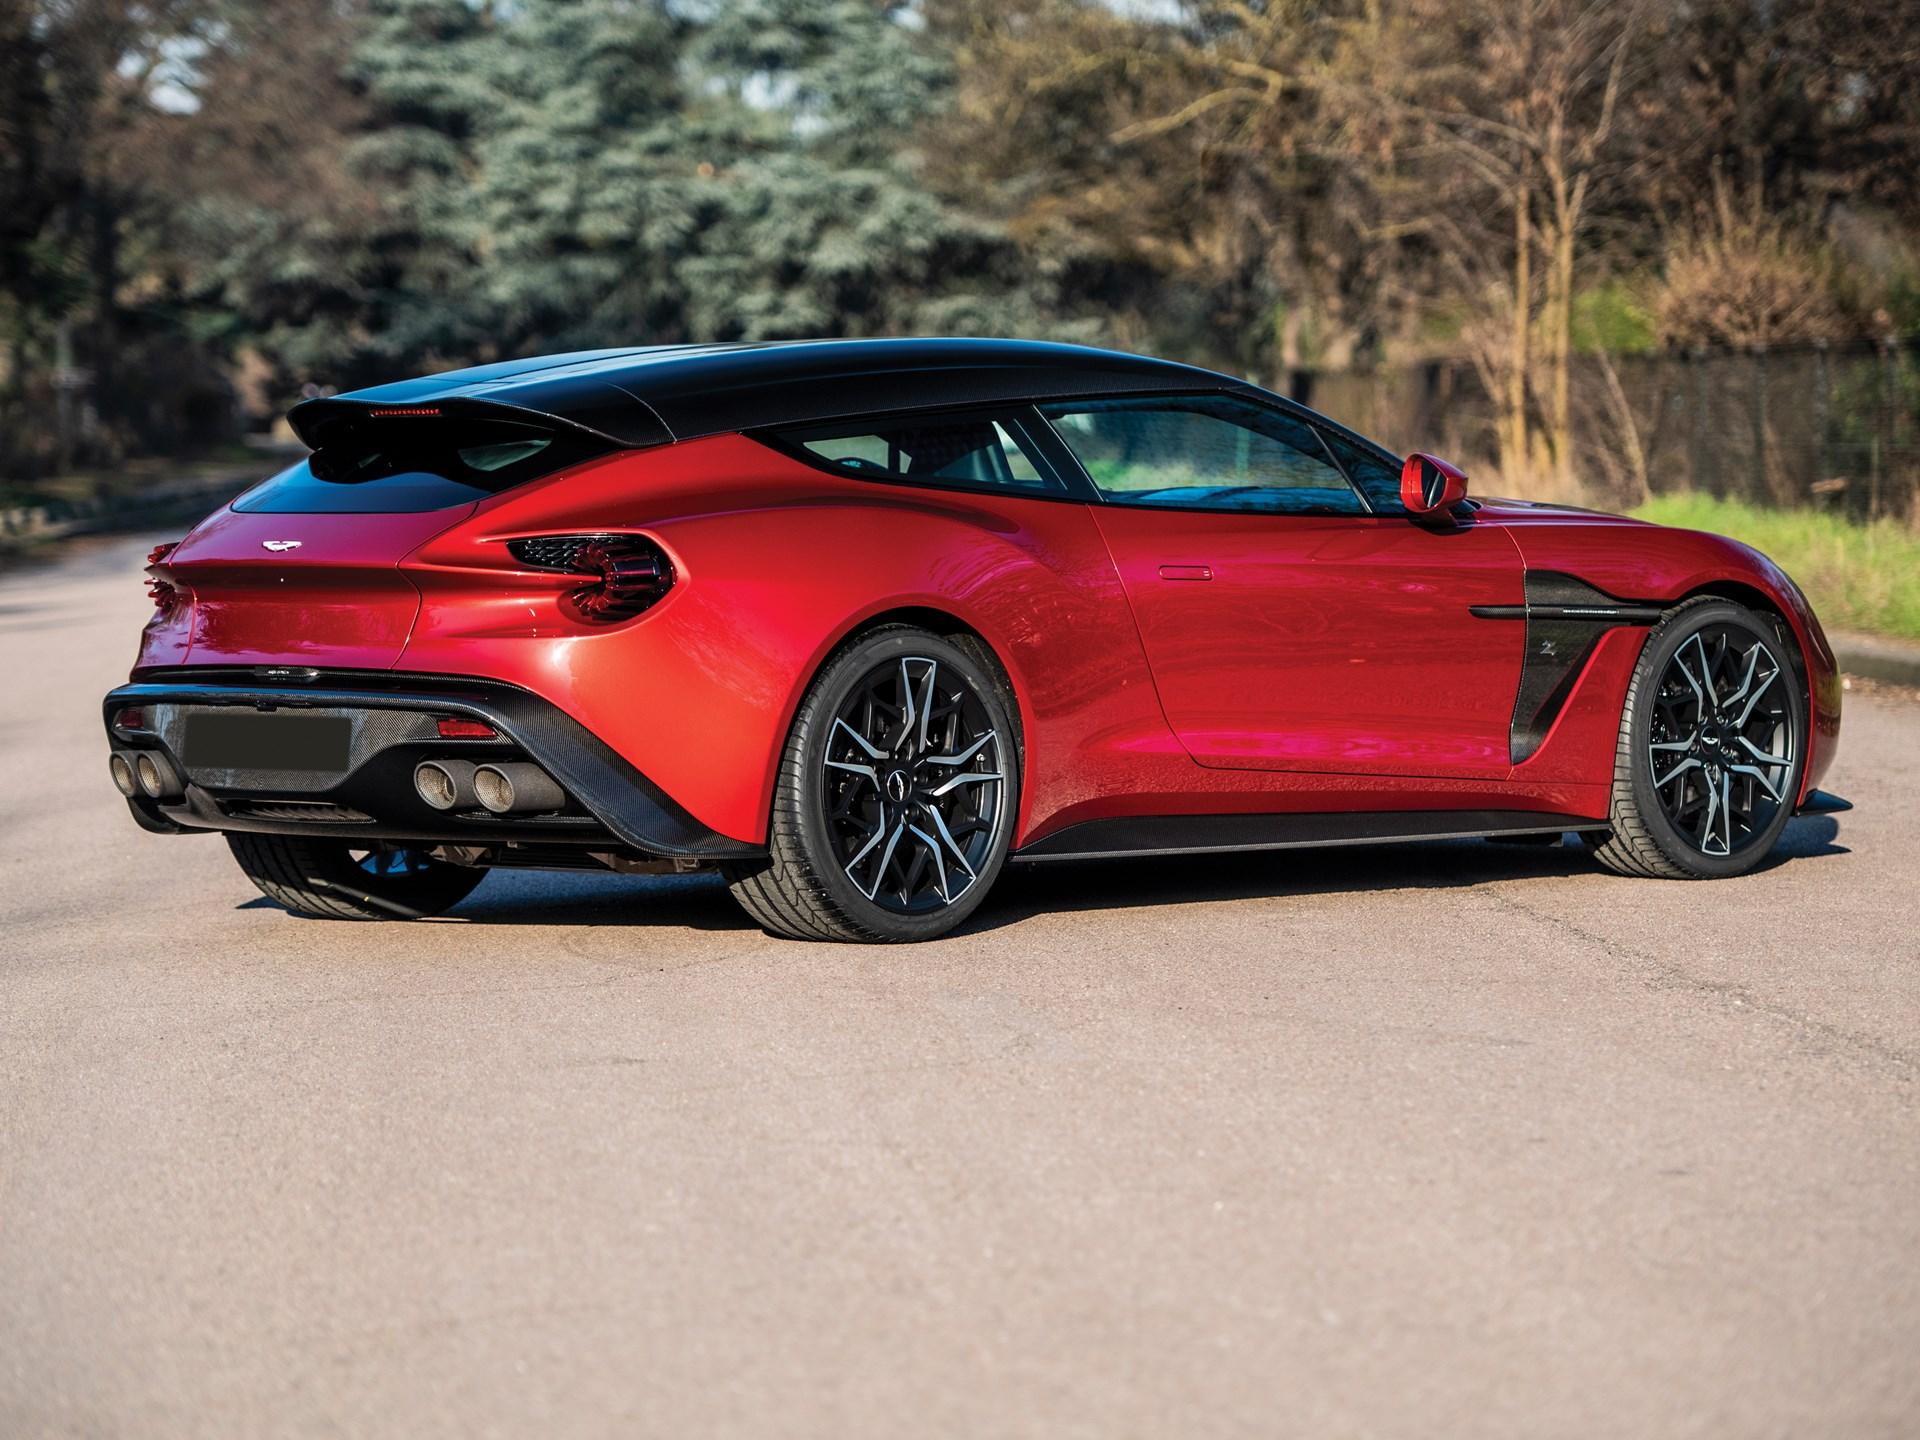 RM Sotheby's - 2019 Aston Martin Vanquish Zagato Shooting